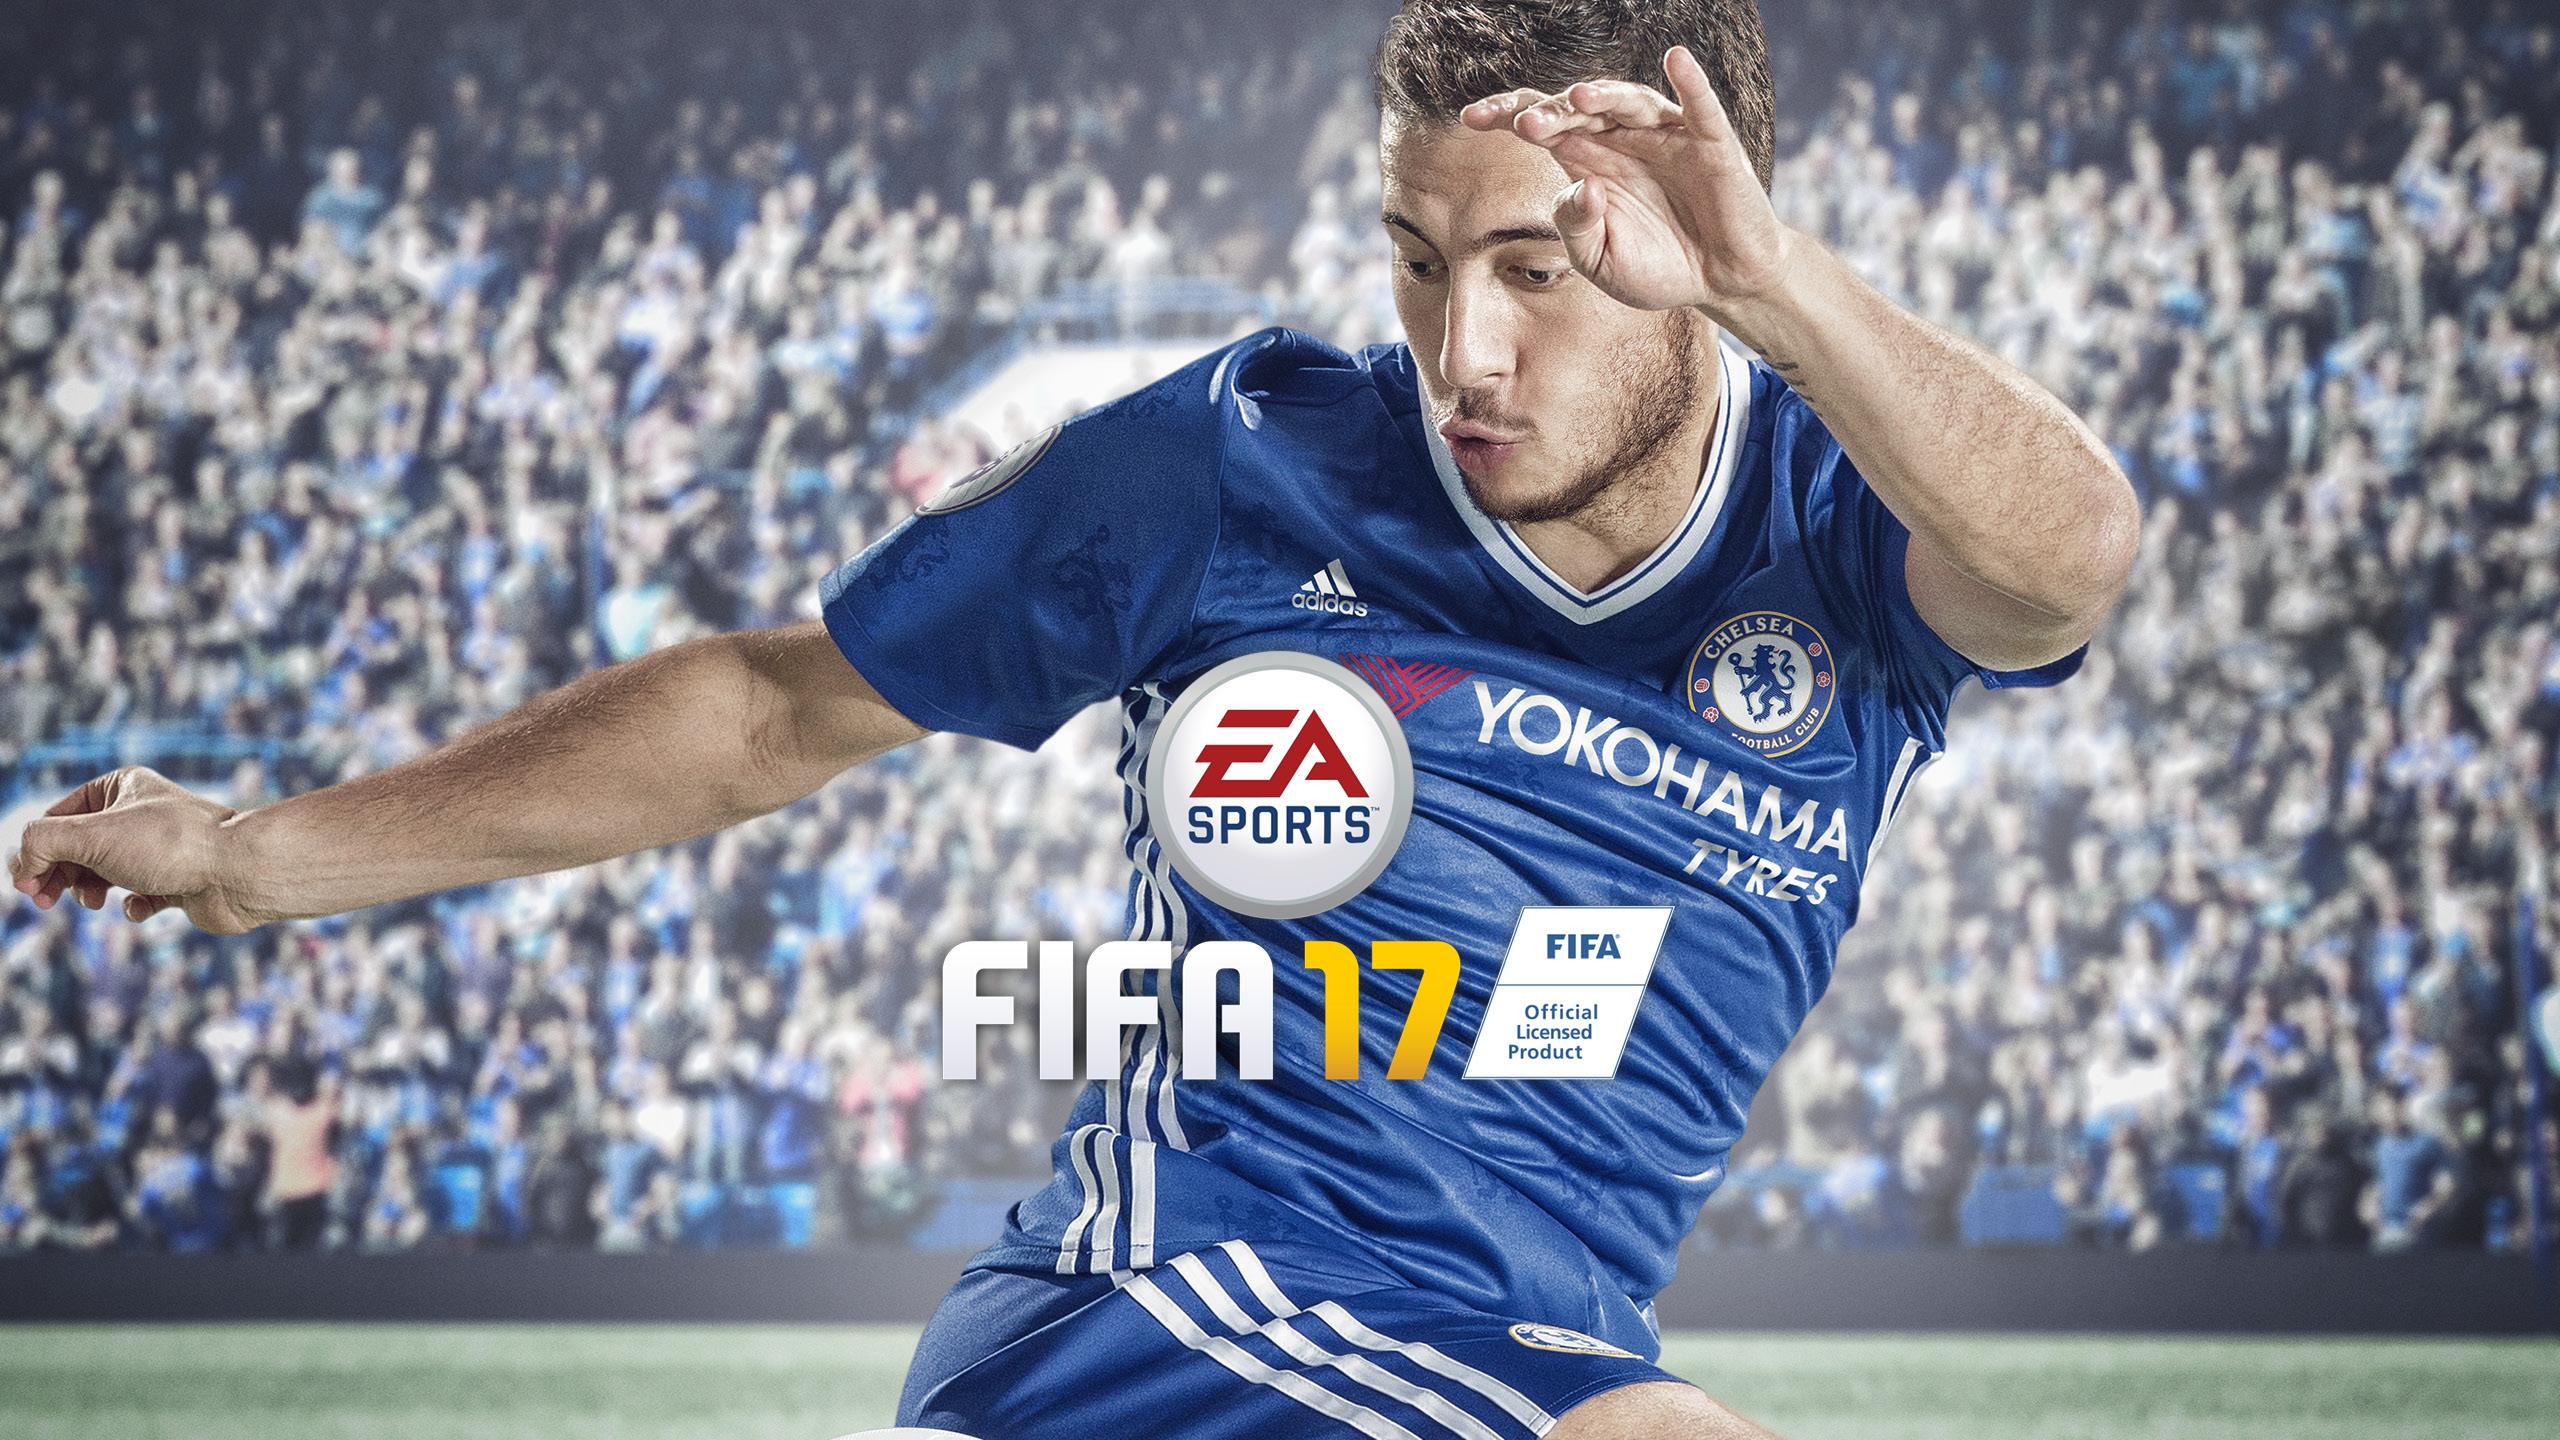 Eden Hazard FIFA 17 Wallpaper